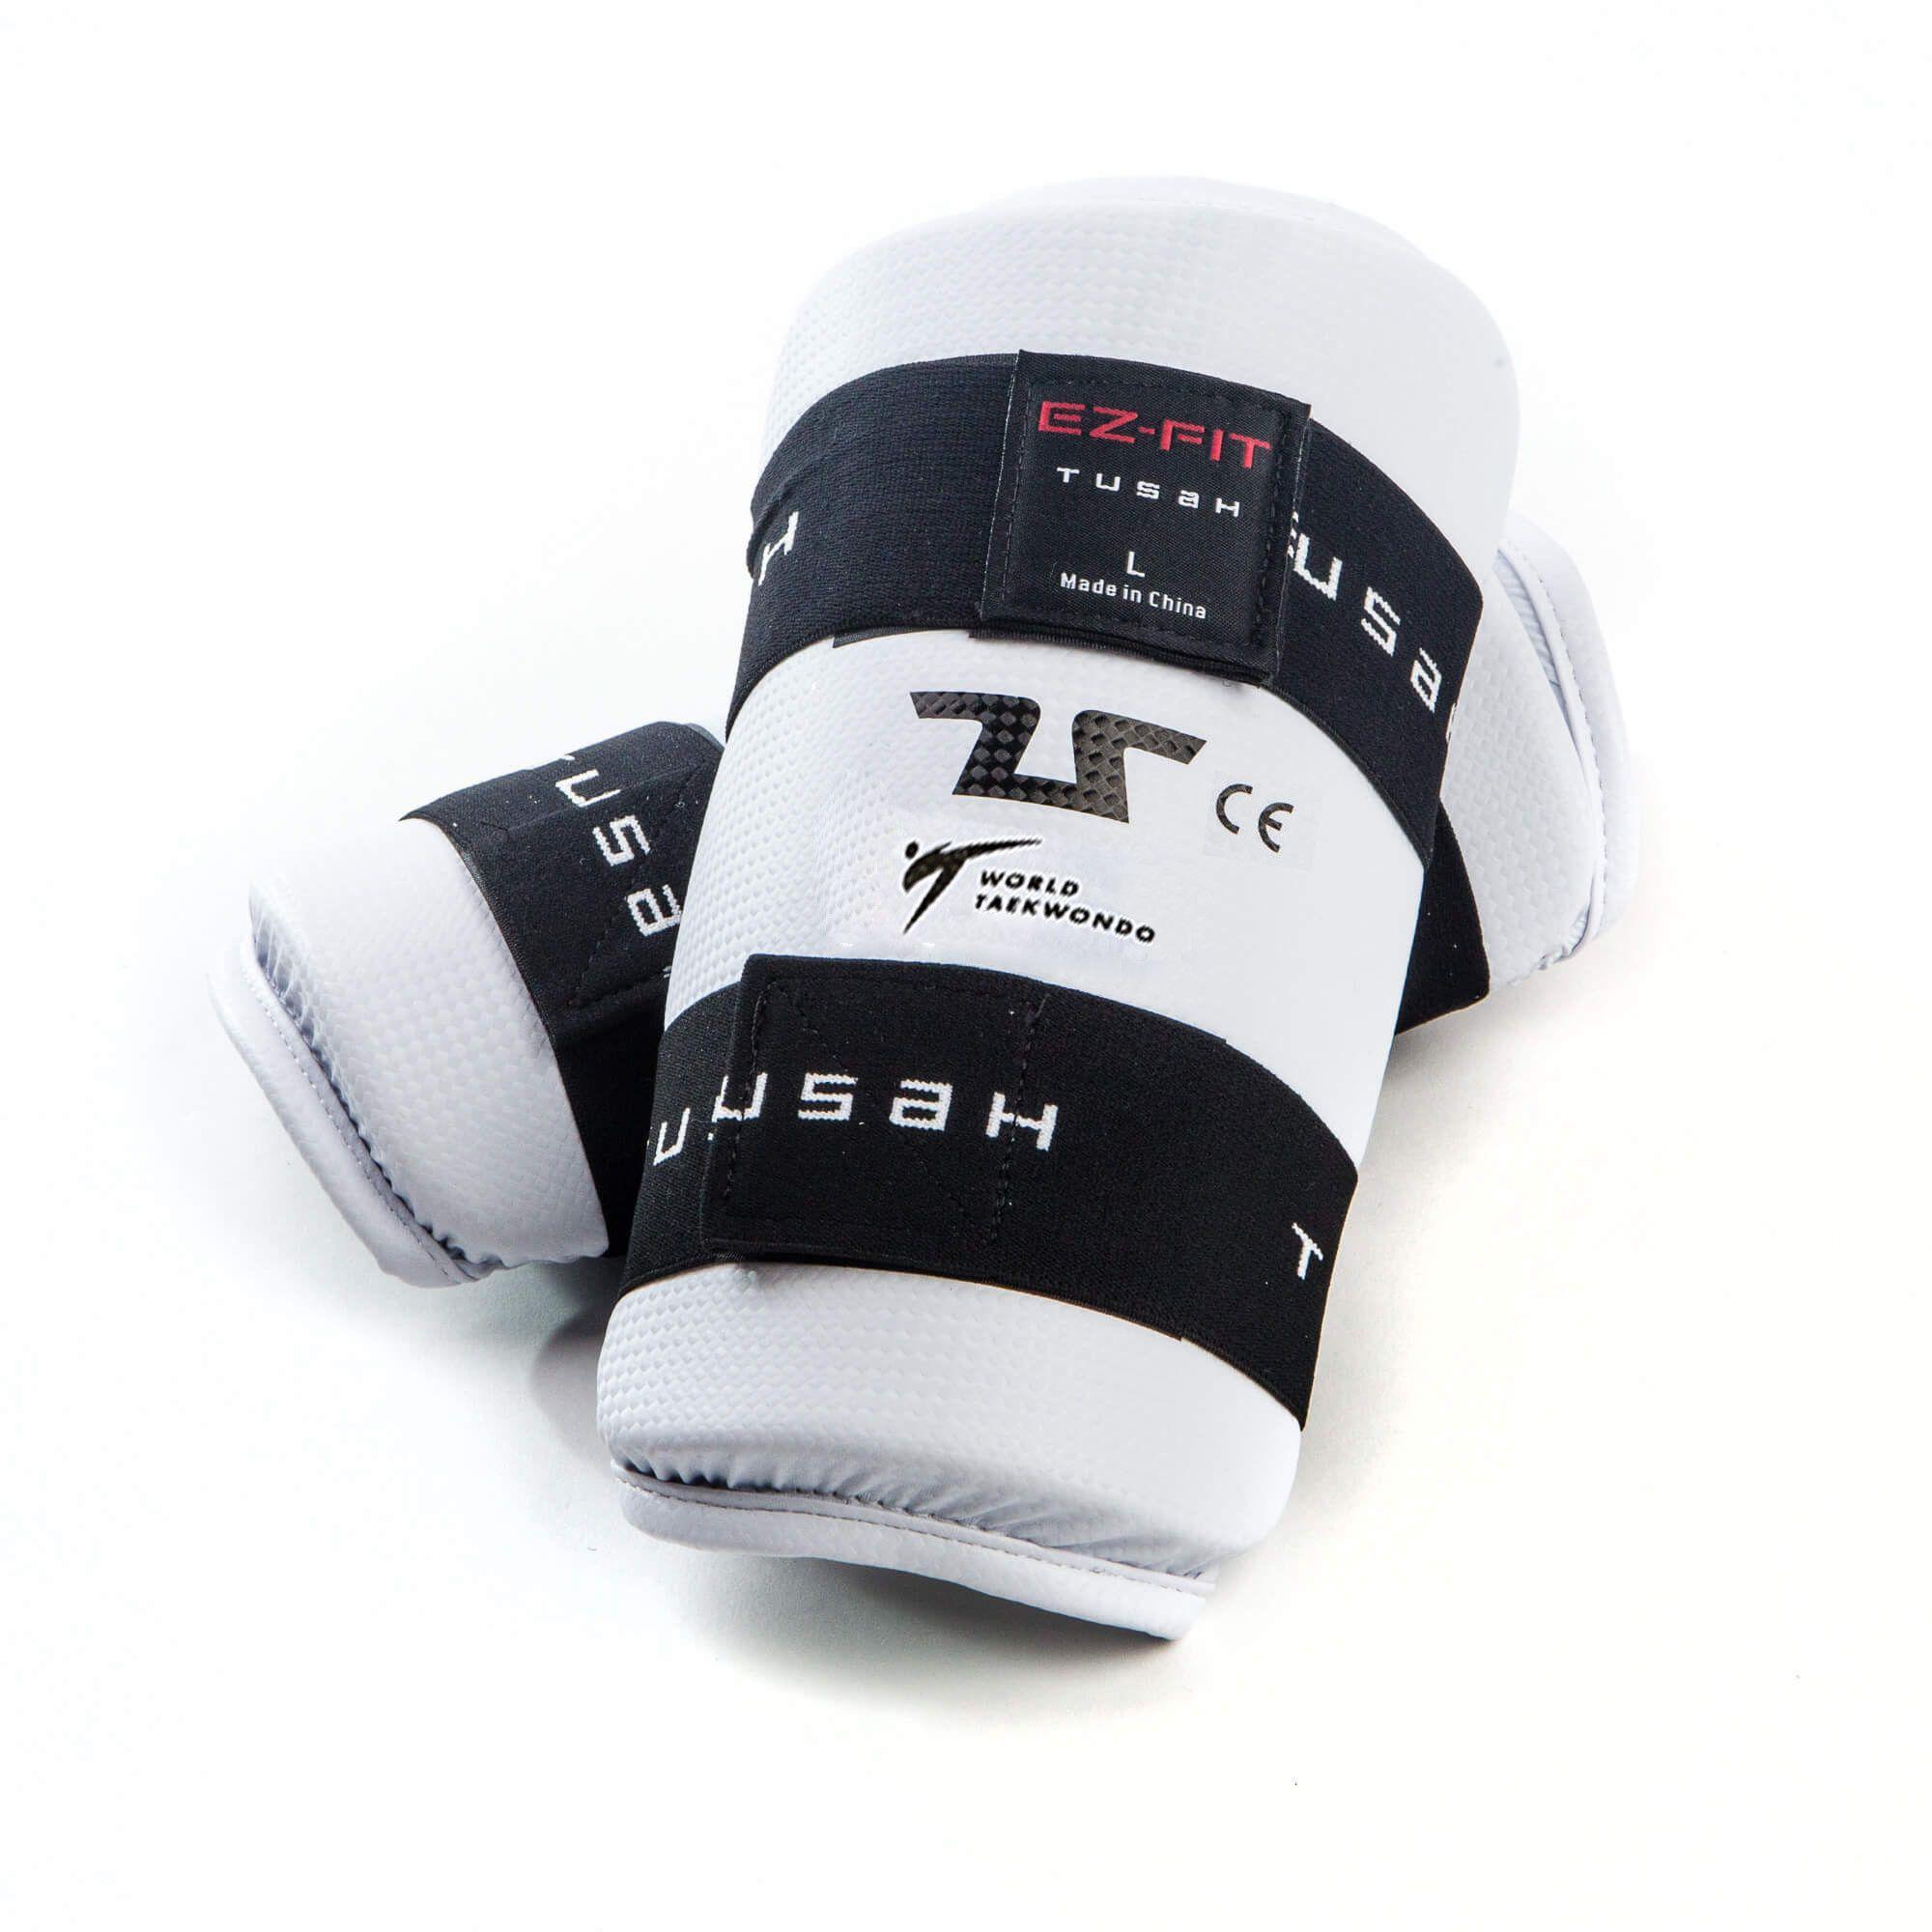 KIT per Taekwondo WT Tusah Completo senza parapiedi